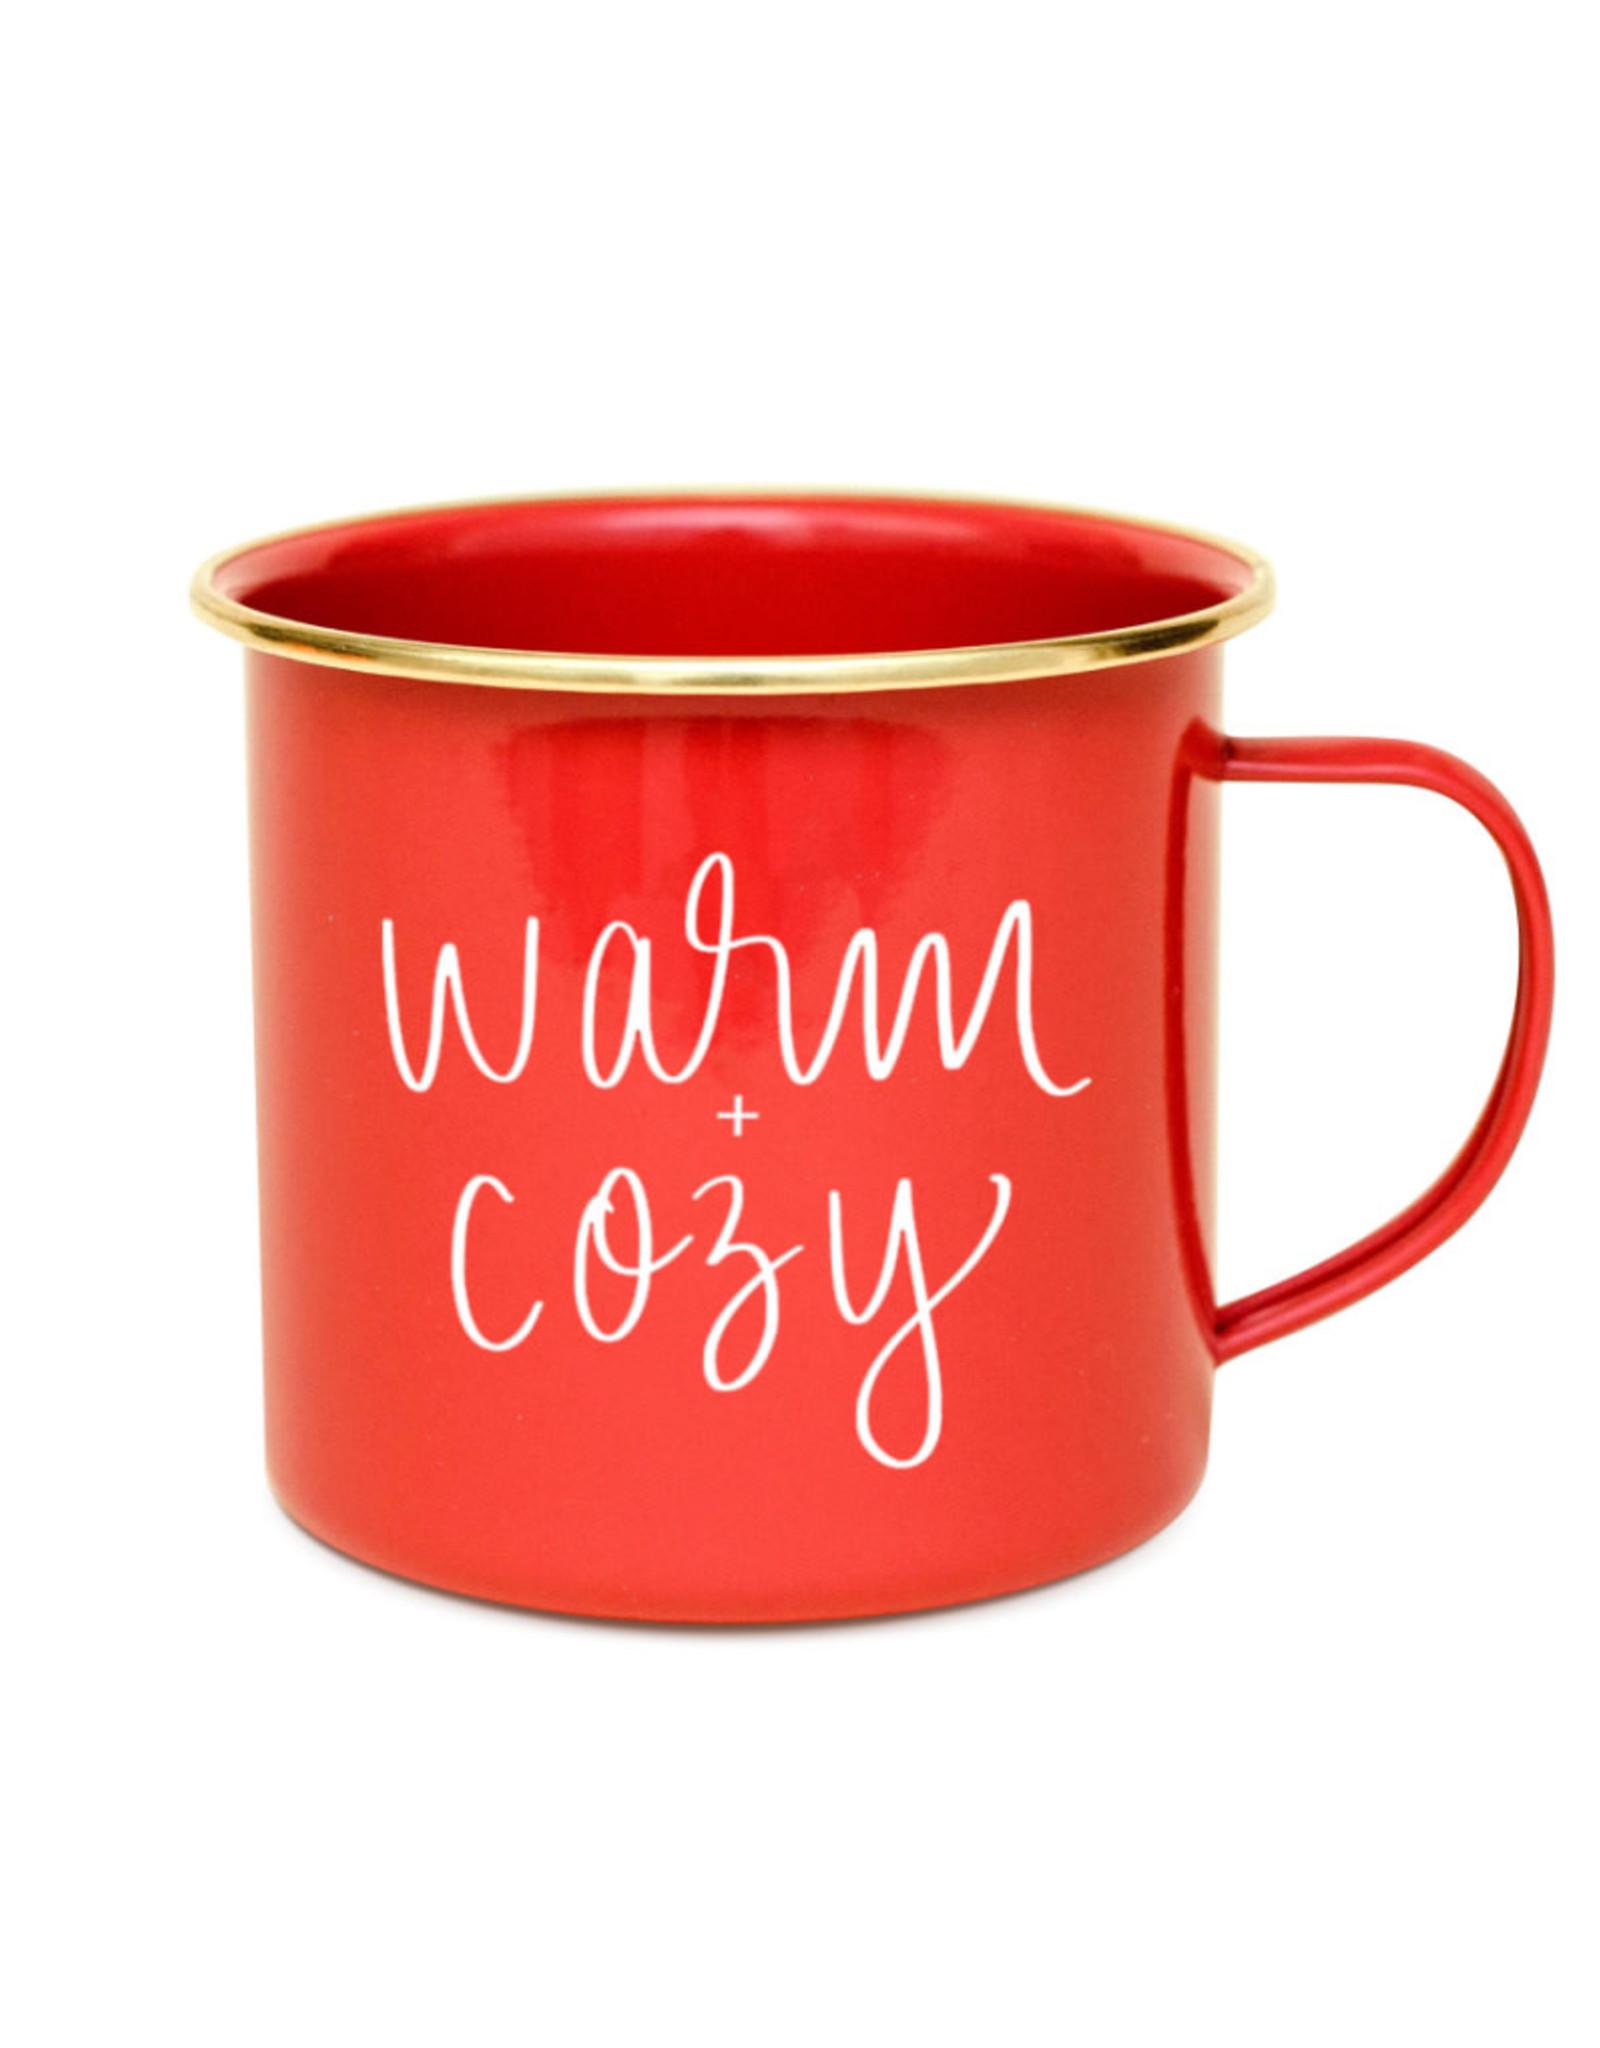 Cozy & Warm Mug